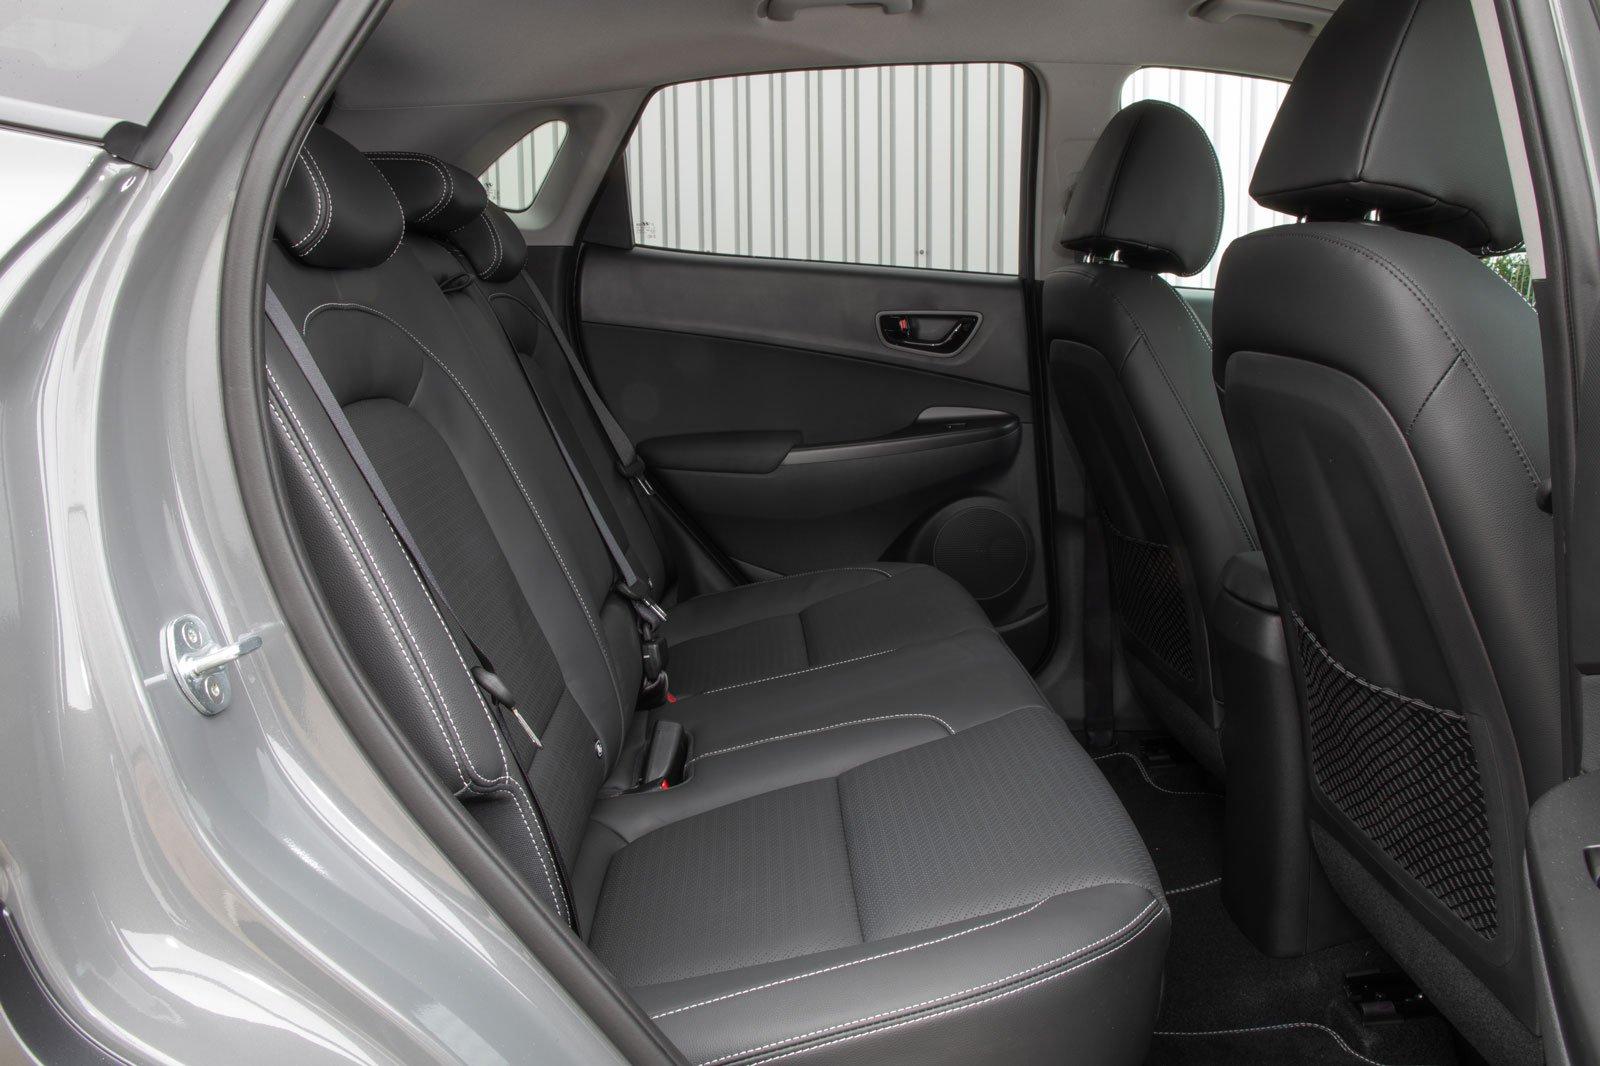 2019 hyundai kona hybrid interior rear seats